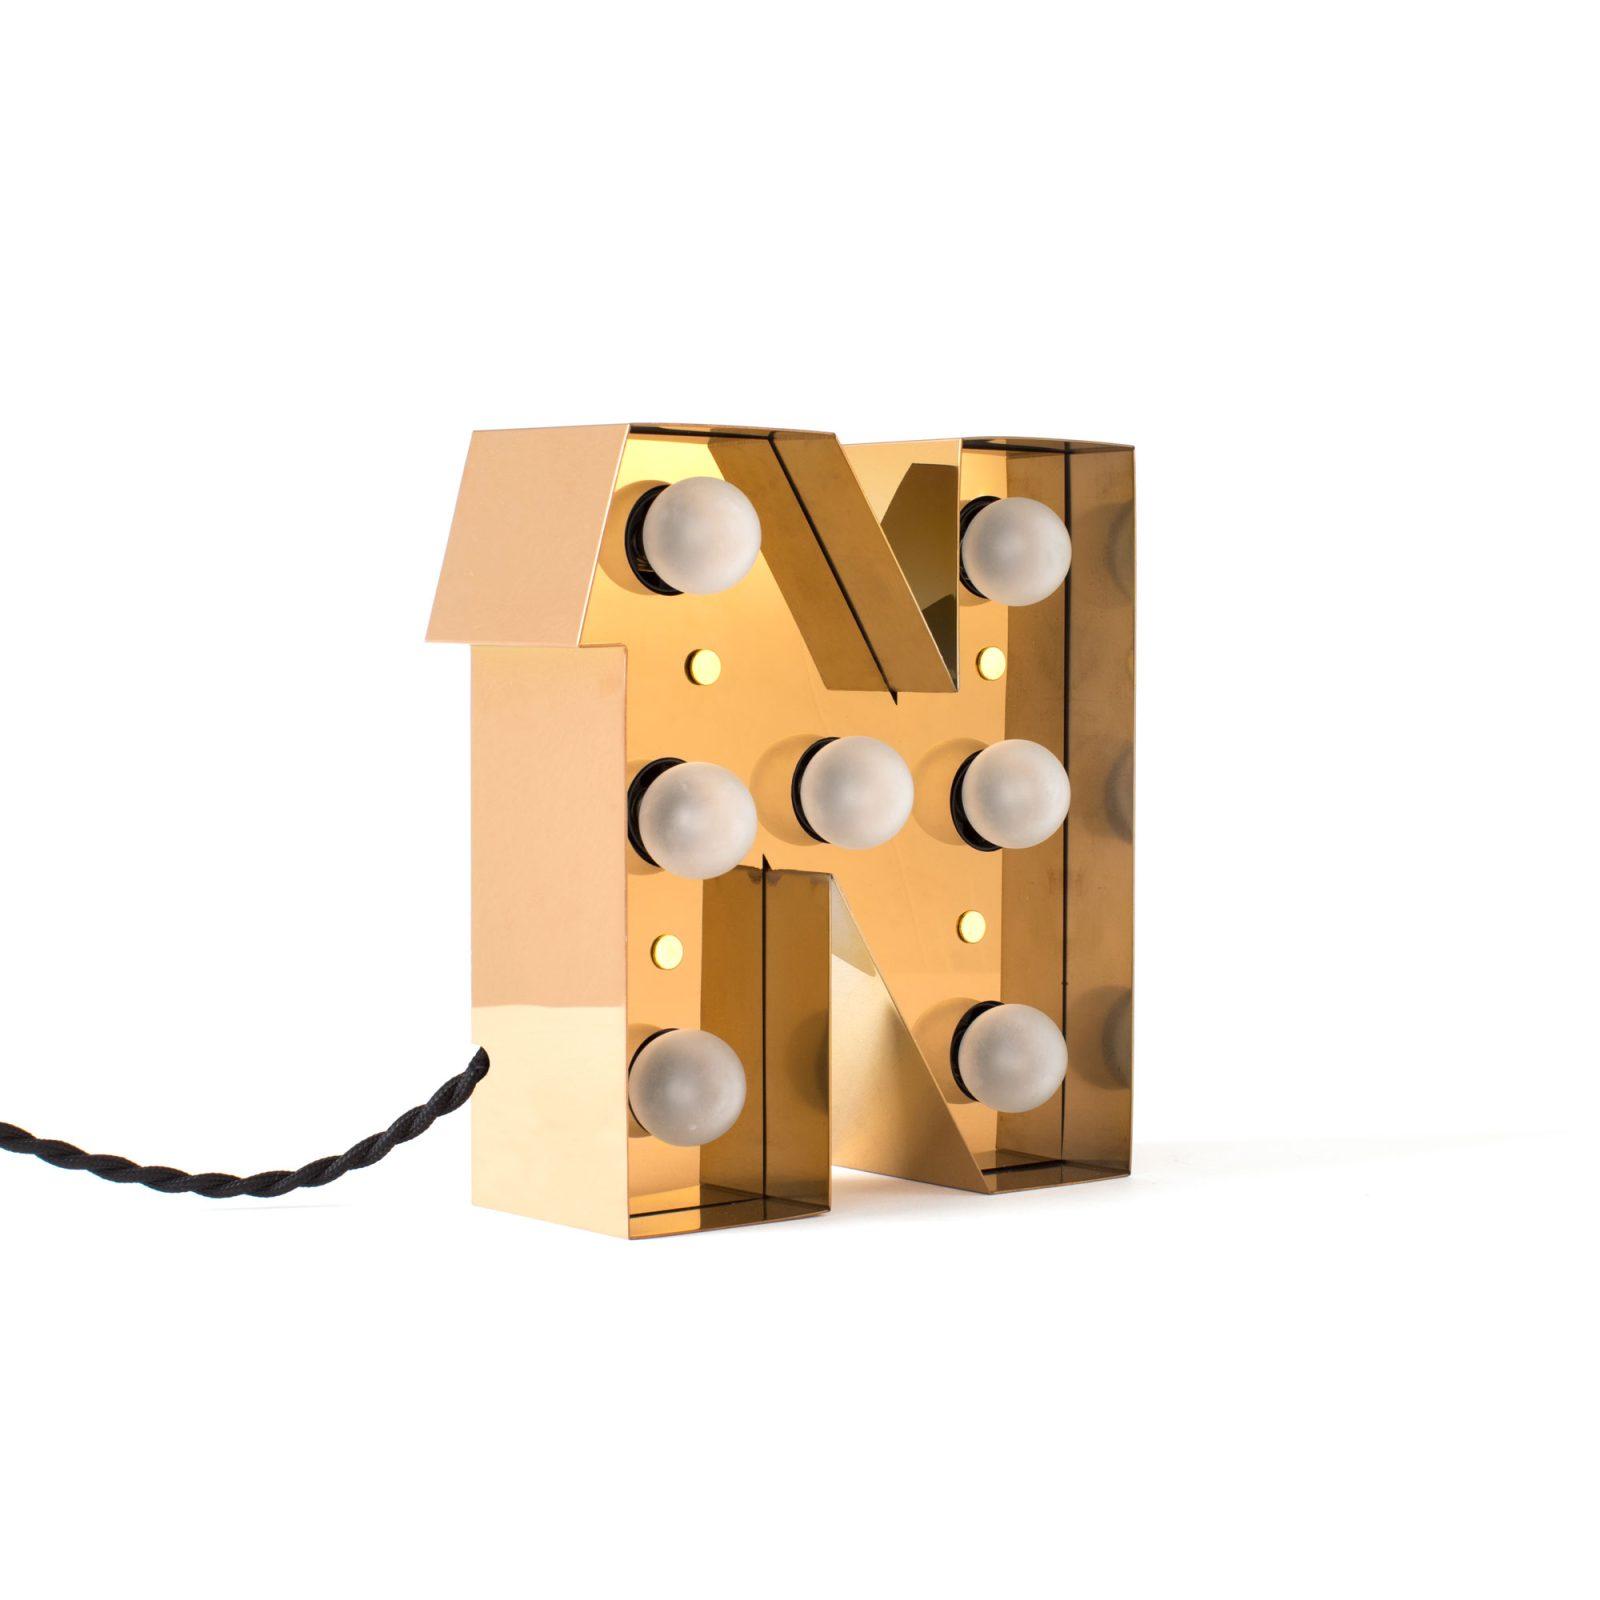 Caractère Alphabet Lights, N-34537